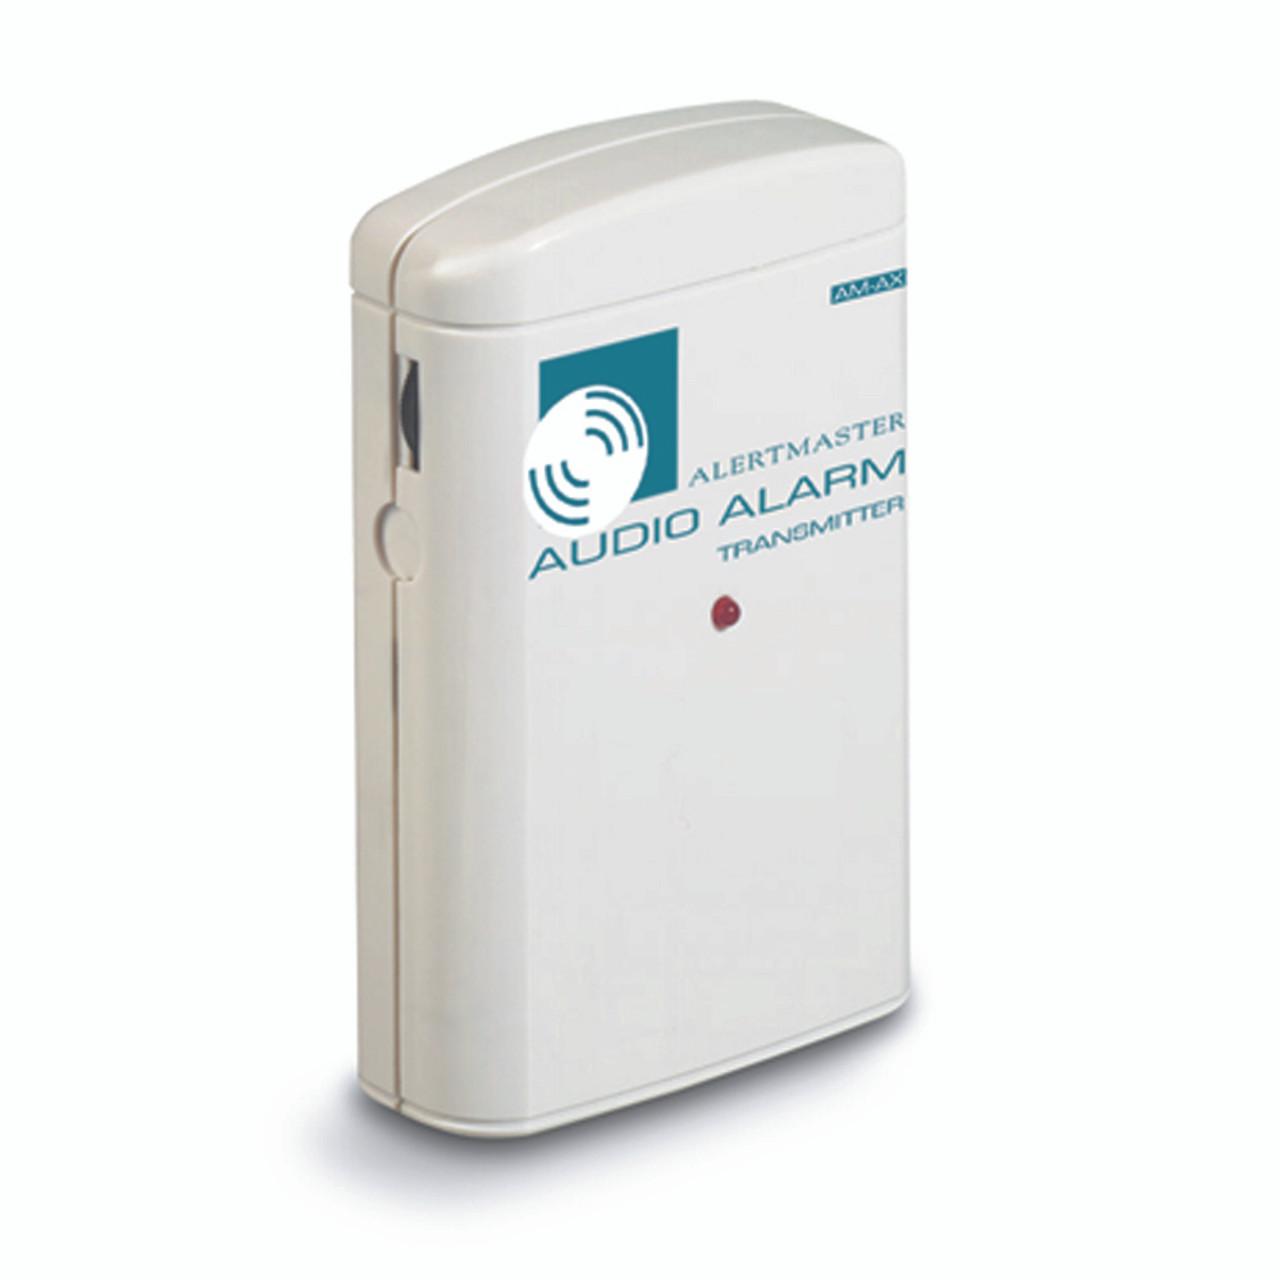 Audio Alarm Transmitter For Alertmaster